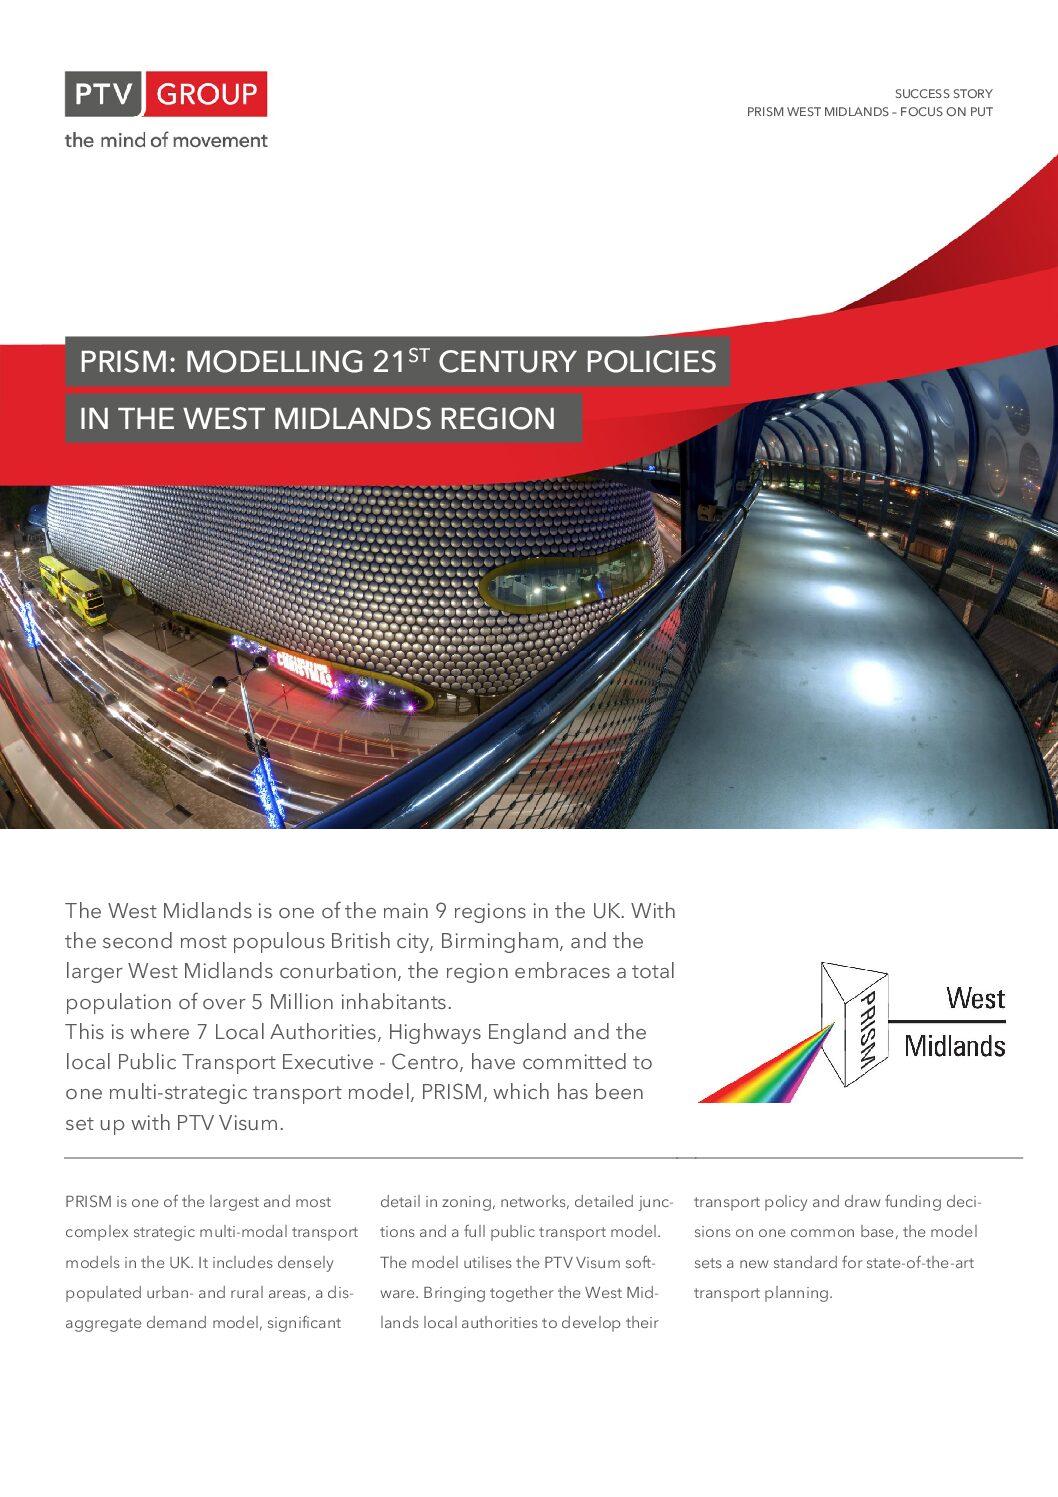 PTV Visum Success Story: West Midlands